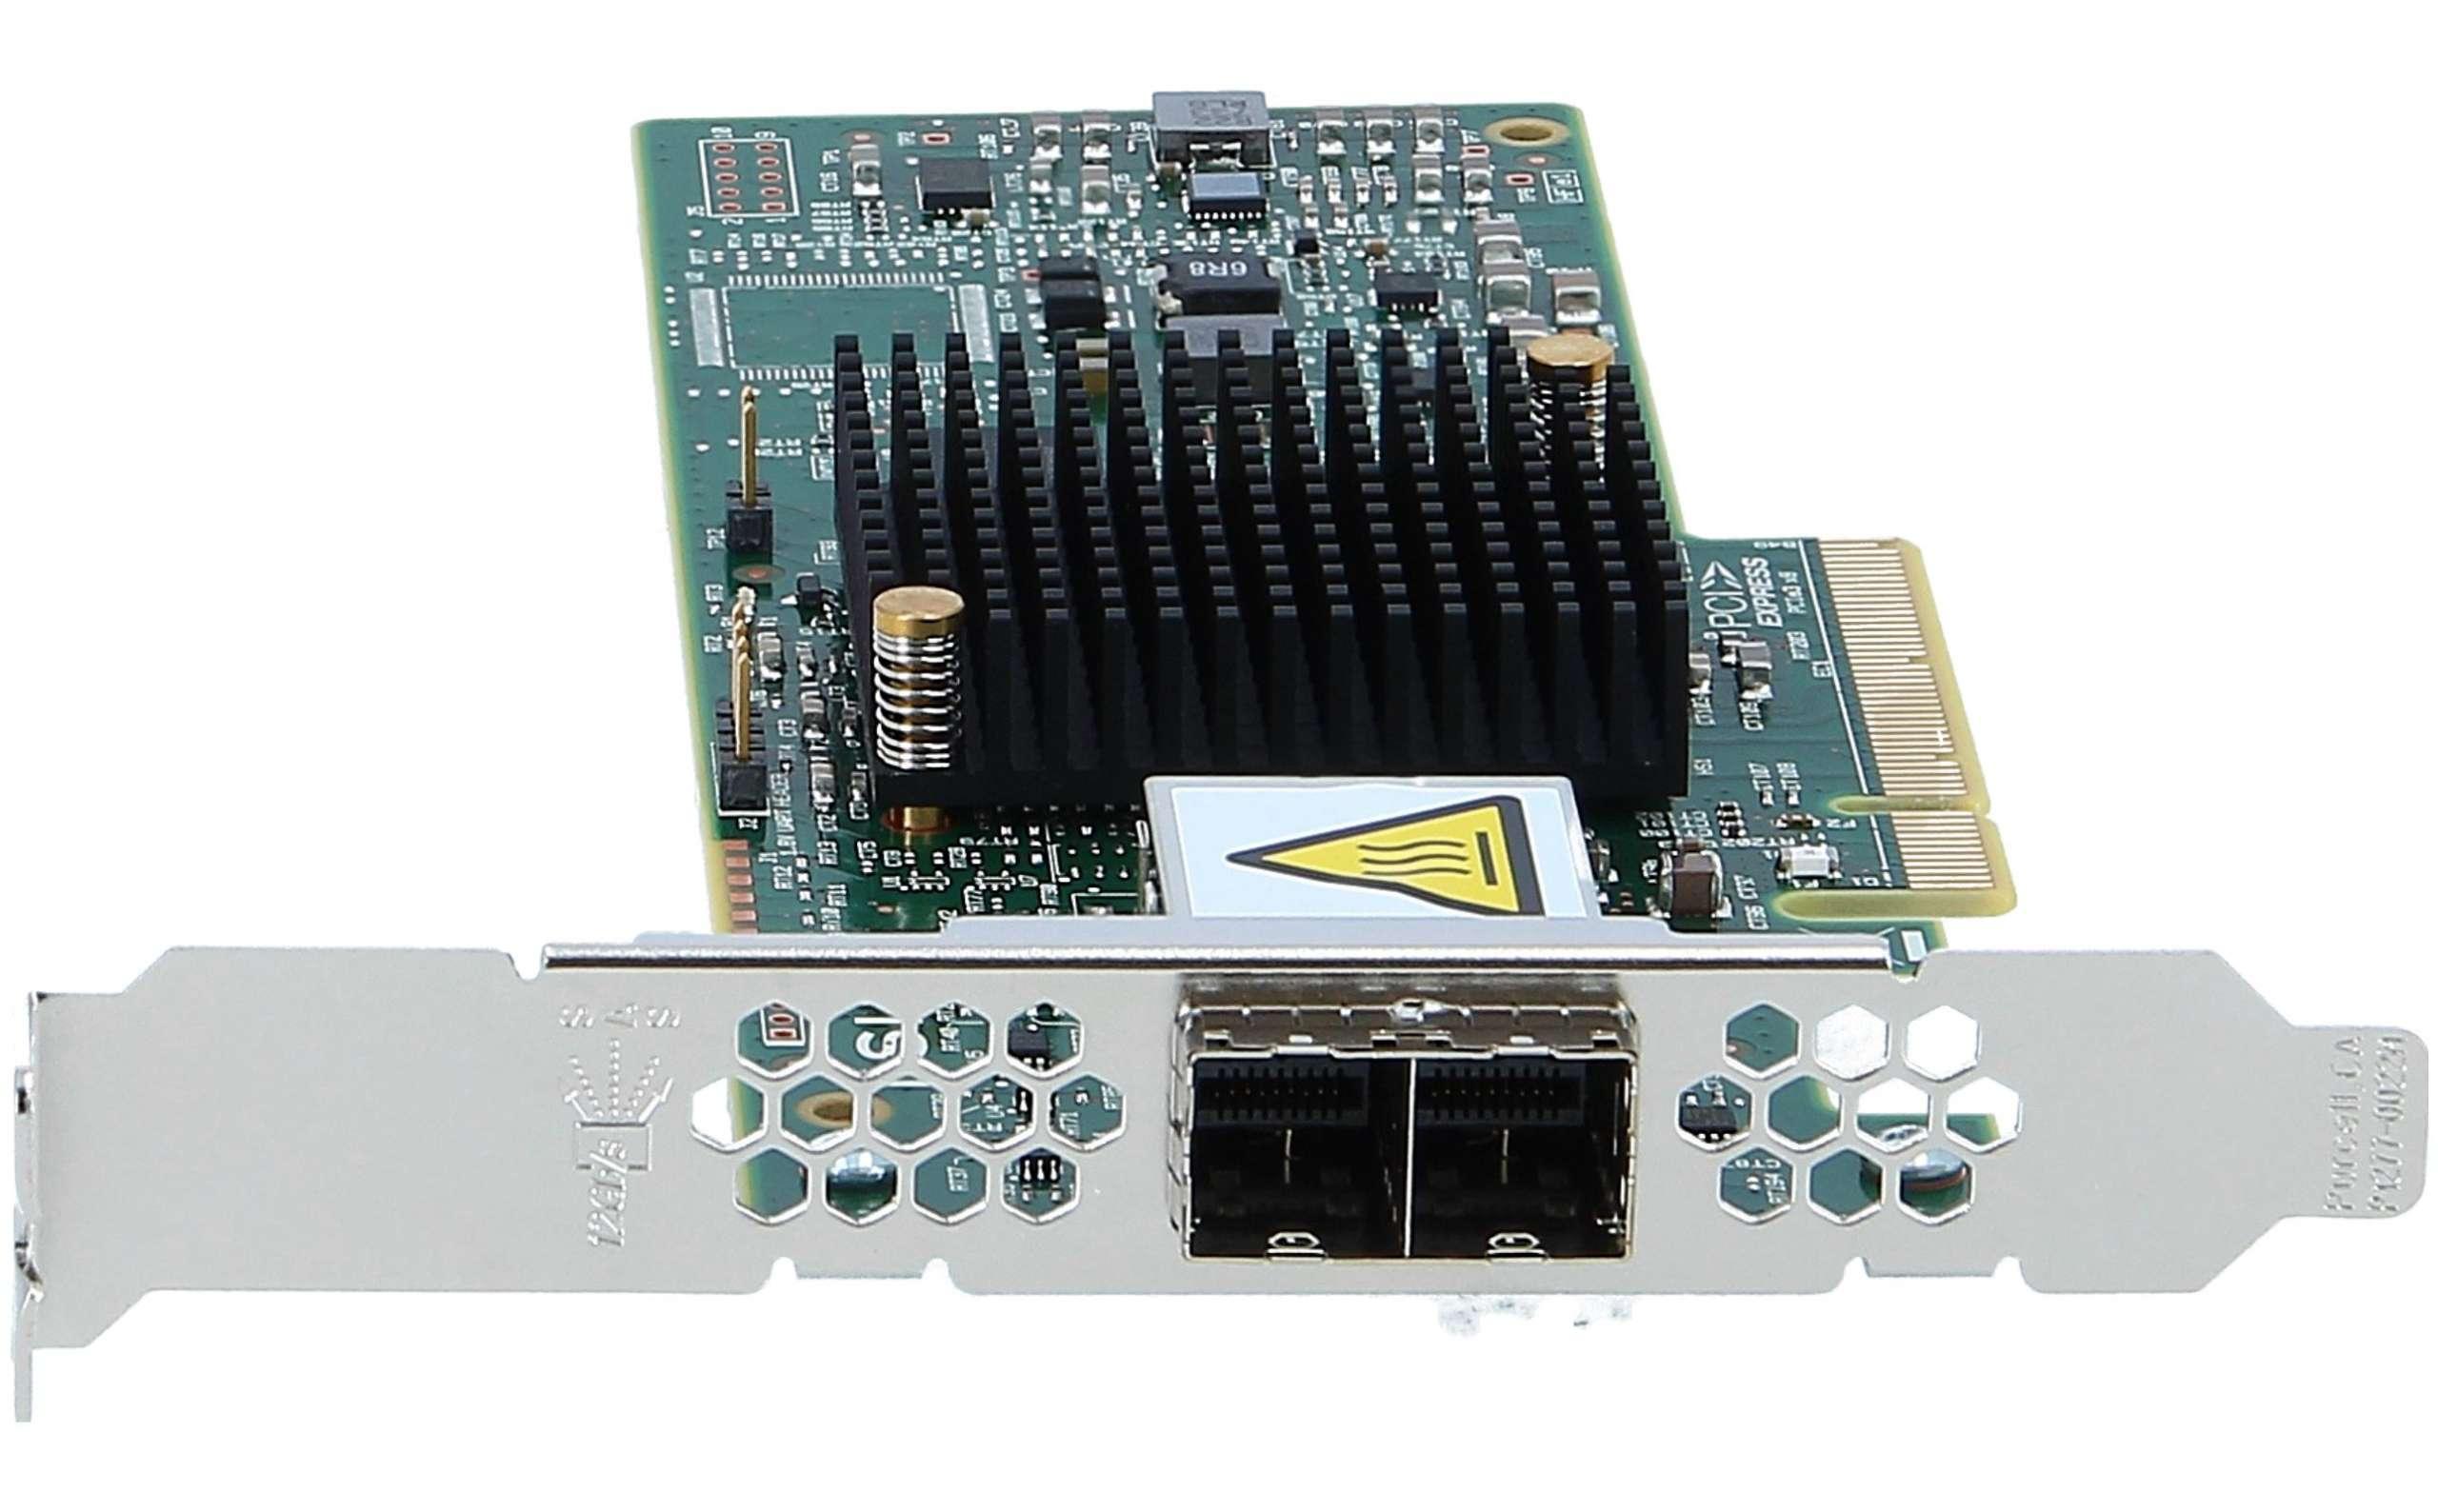 Storage Controller 8 Channel 00AE912 Lenovo N2225 SAS//SATA HBA for IBM System x